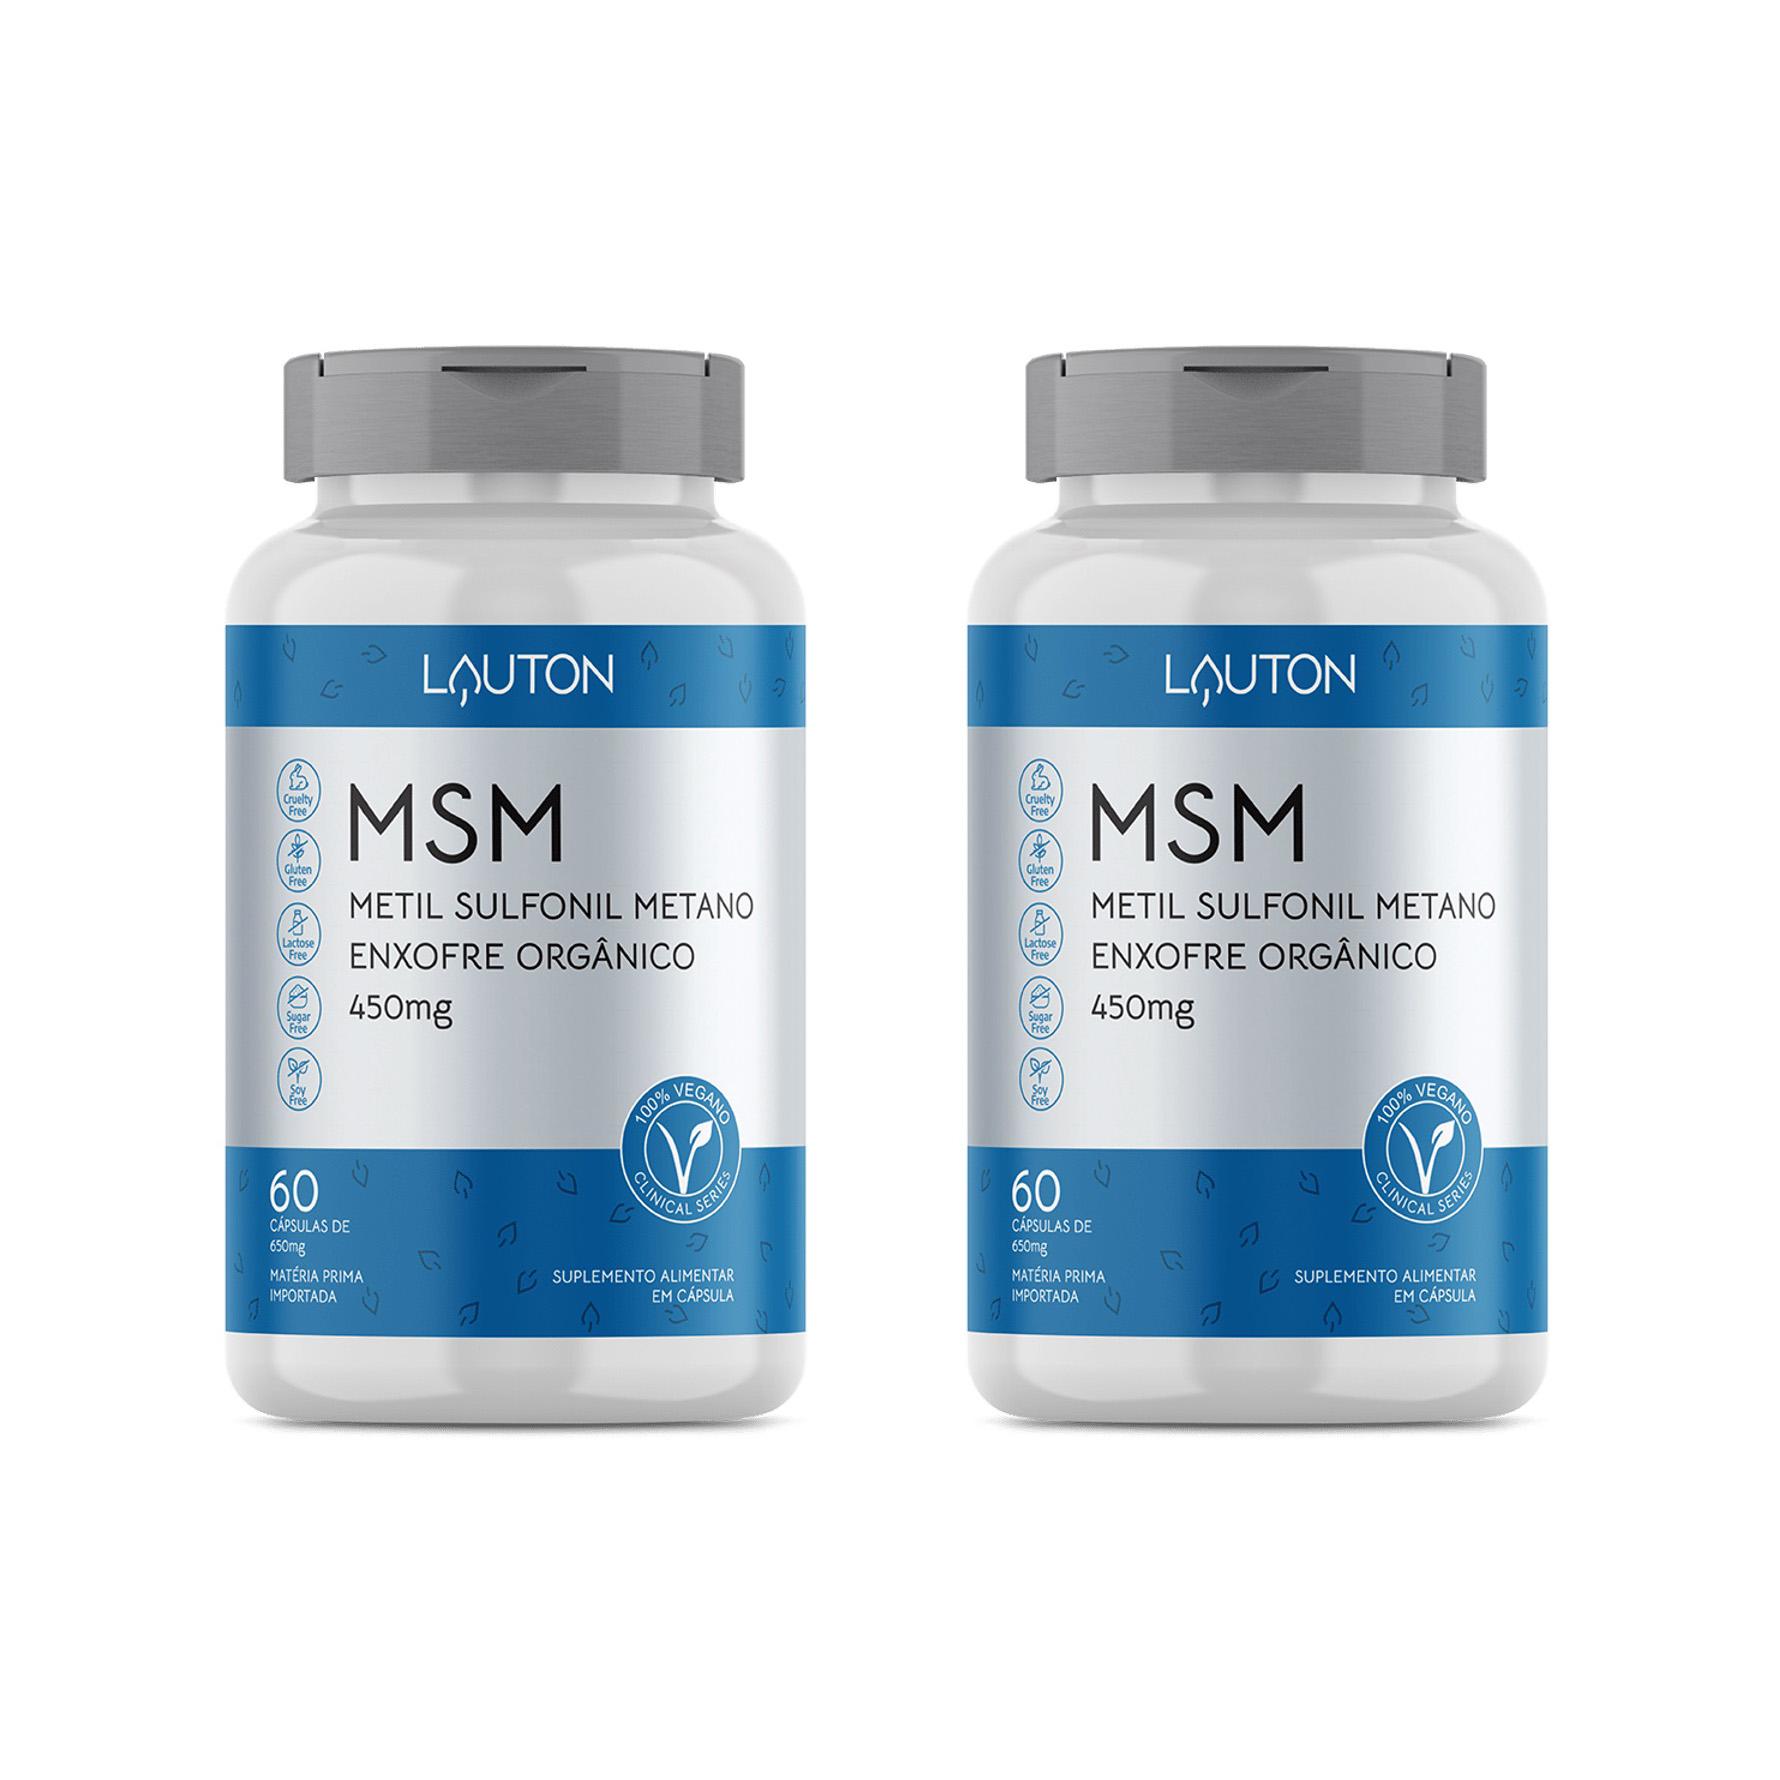 MSM - Metil Sulfonil Metano 450mg - 60 Cápsulas - Lauton Nutrition (2 Unidades)